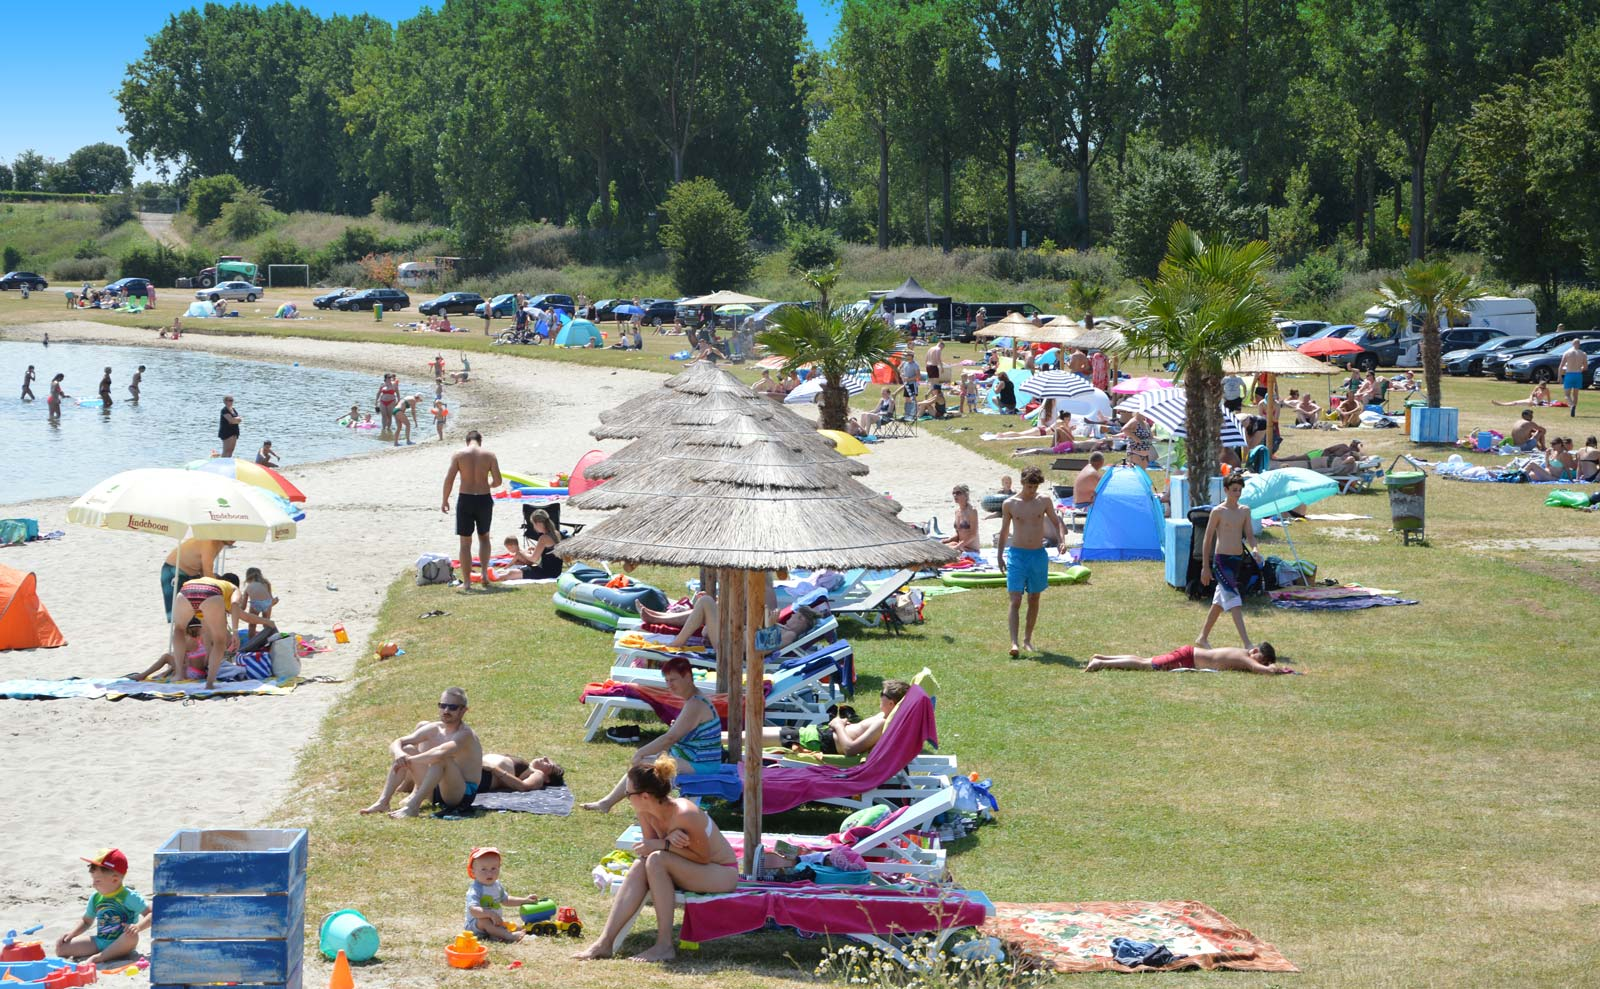 Dagstrand-en-beachclub-PalmBeachRoermond-AreaX-De_Weerd_Noordplas_Roermond